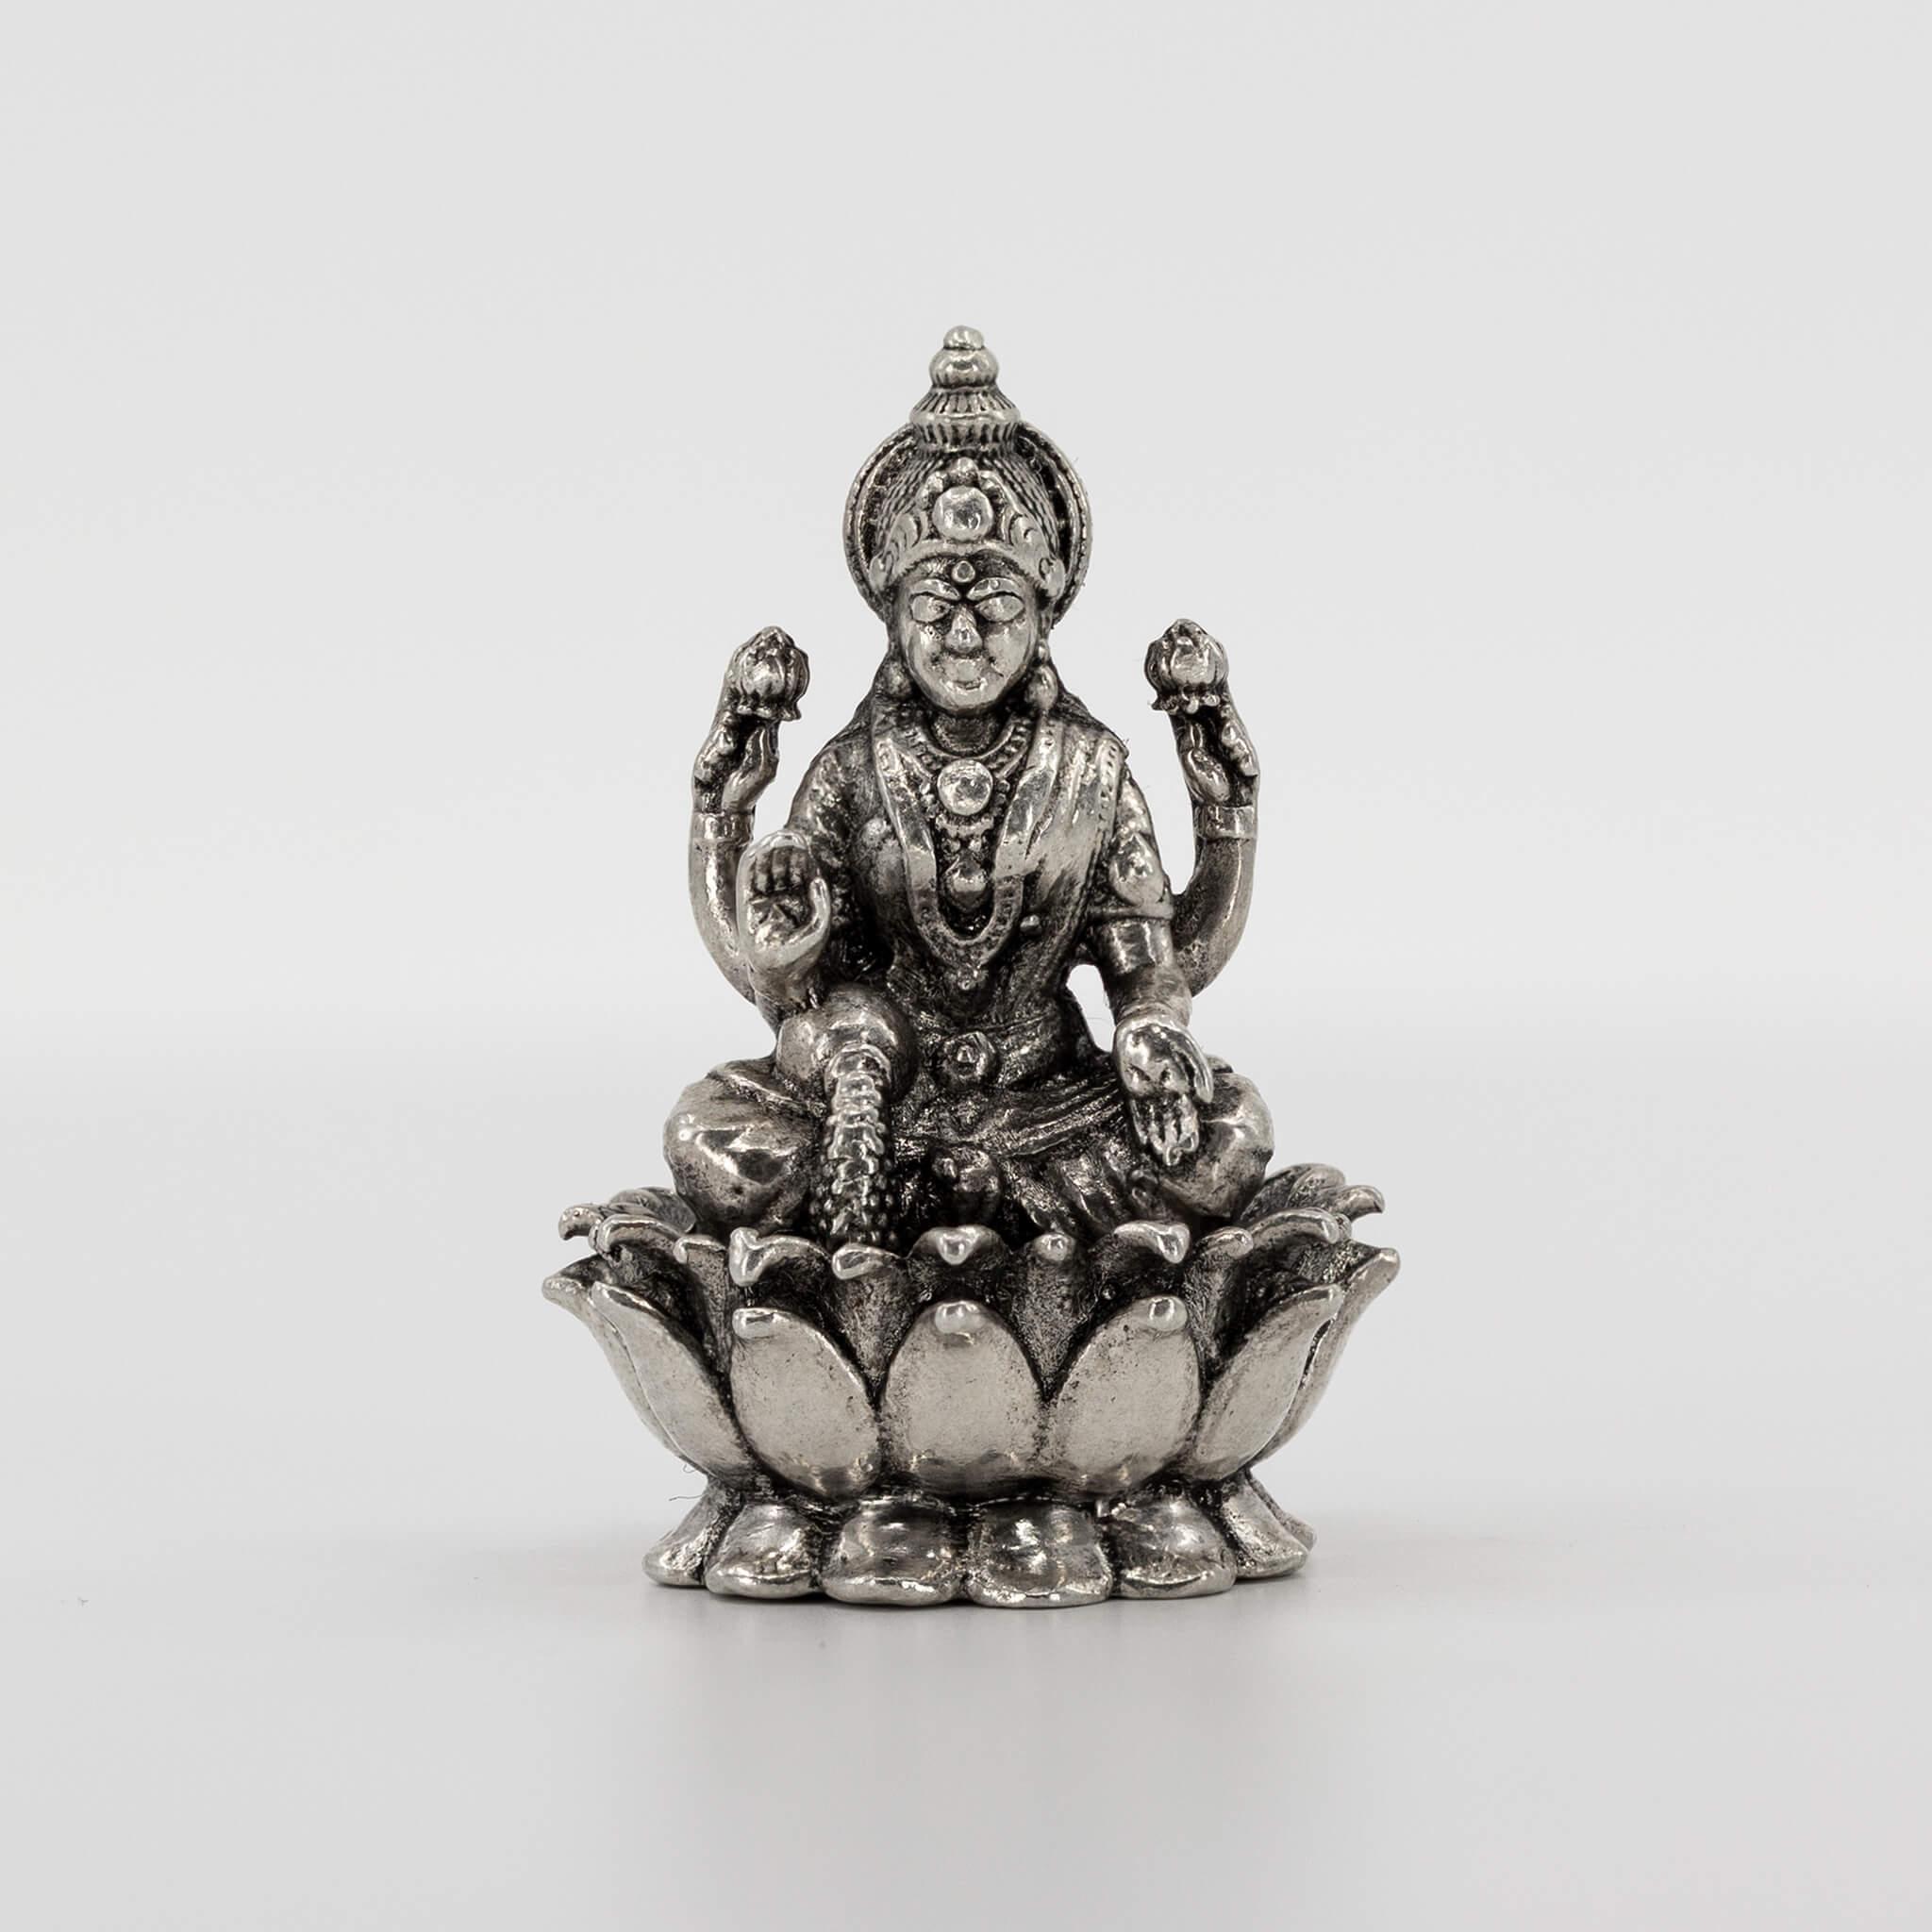 Statue - 3D - Oxidised - Lakshmi